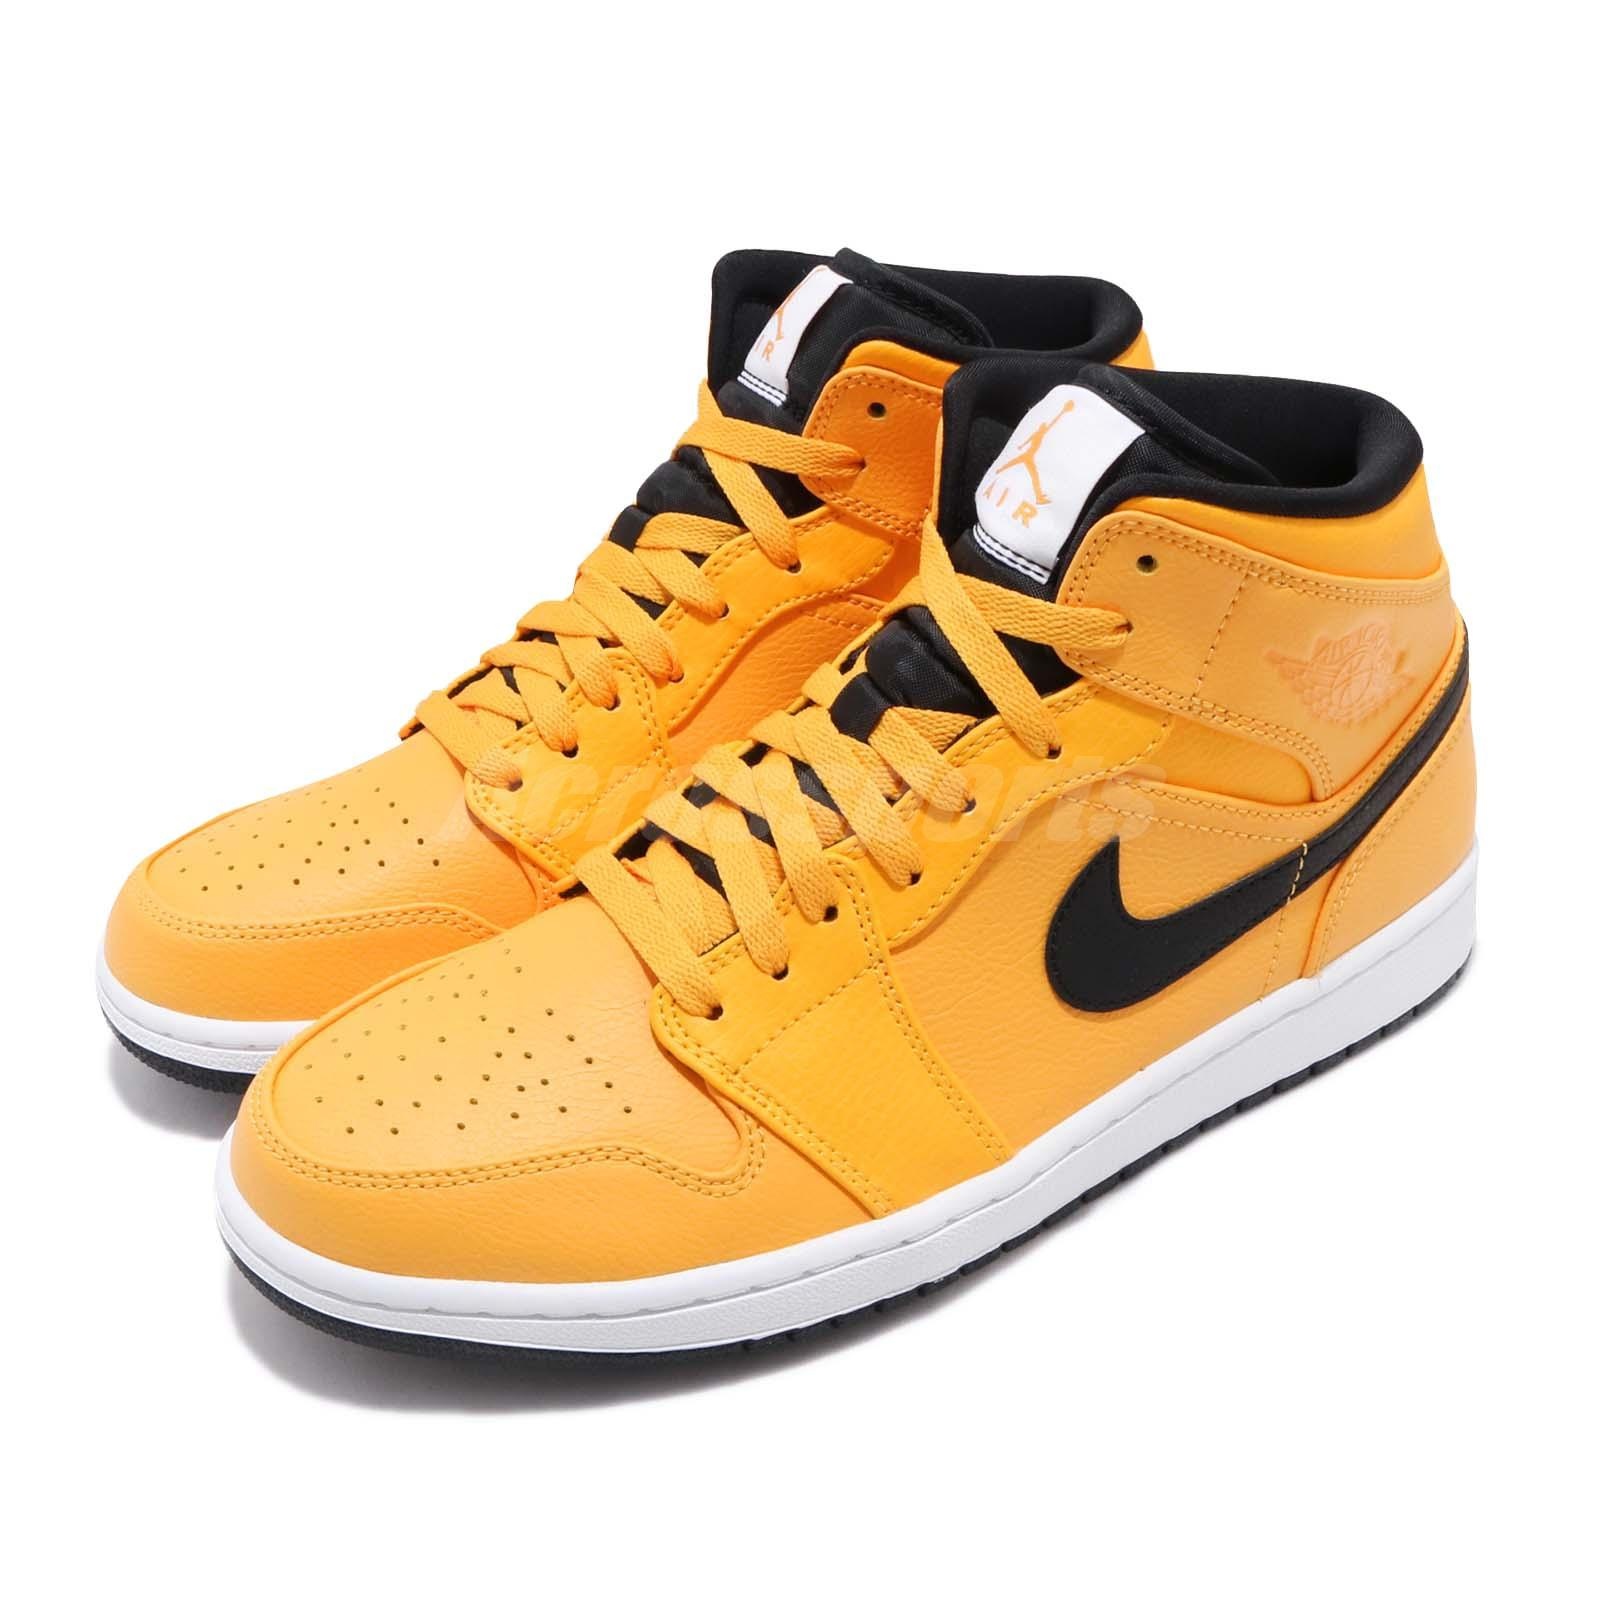 d328cac6de00af Details about Nike Air Jordan 1 MID Taxi University Gold Yellow Black AJ1  Sneakers 554724-700